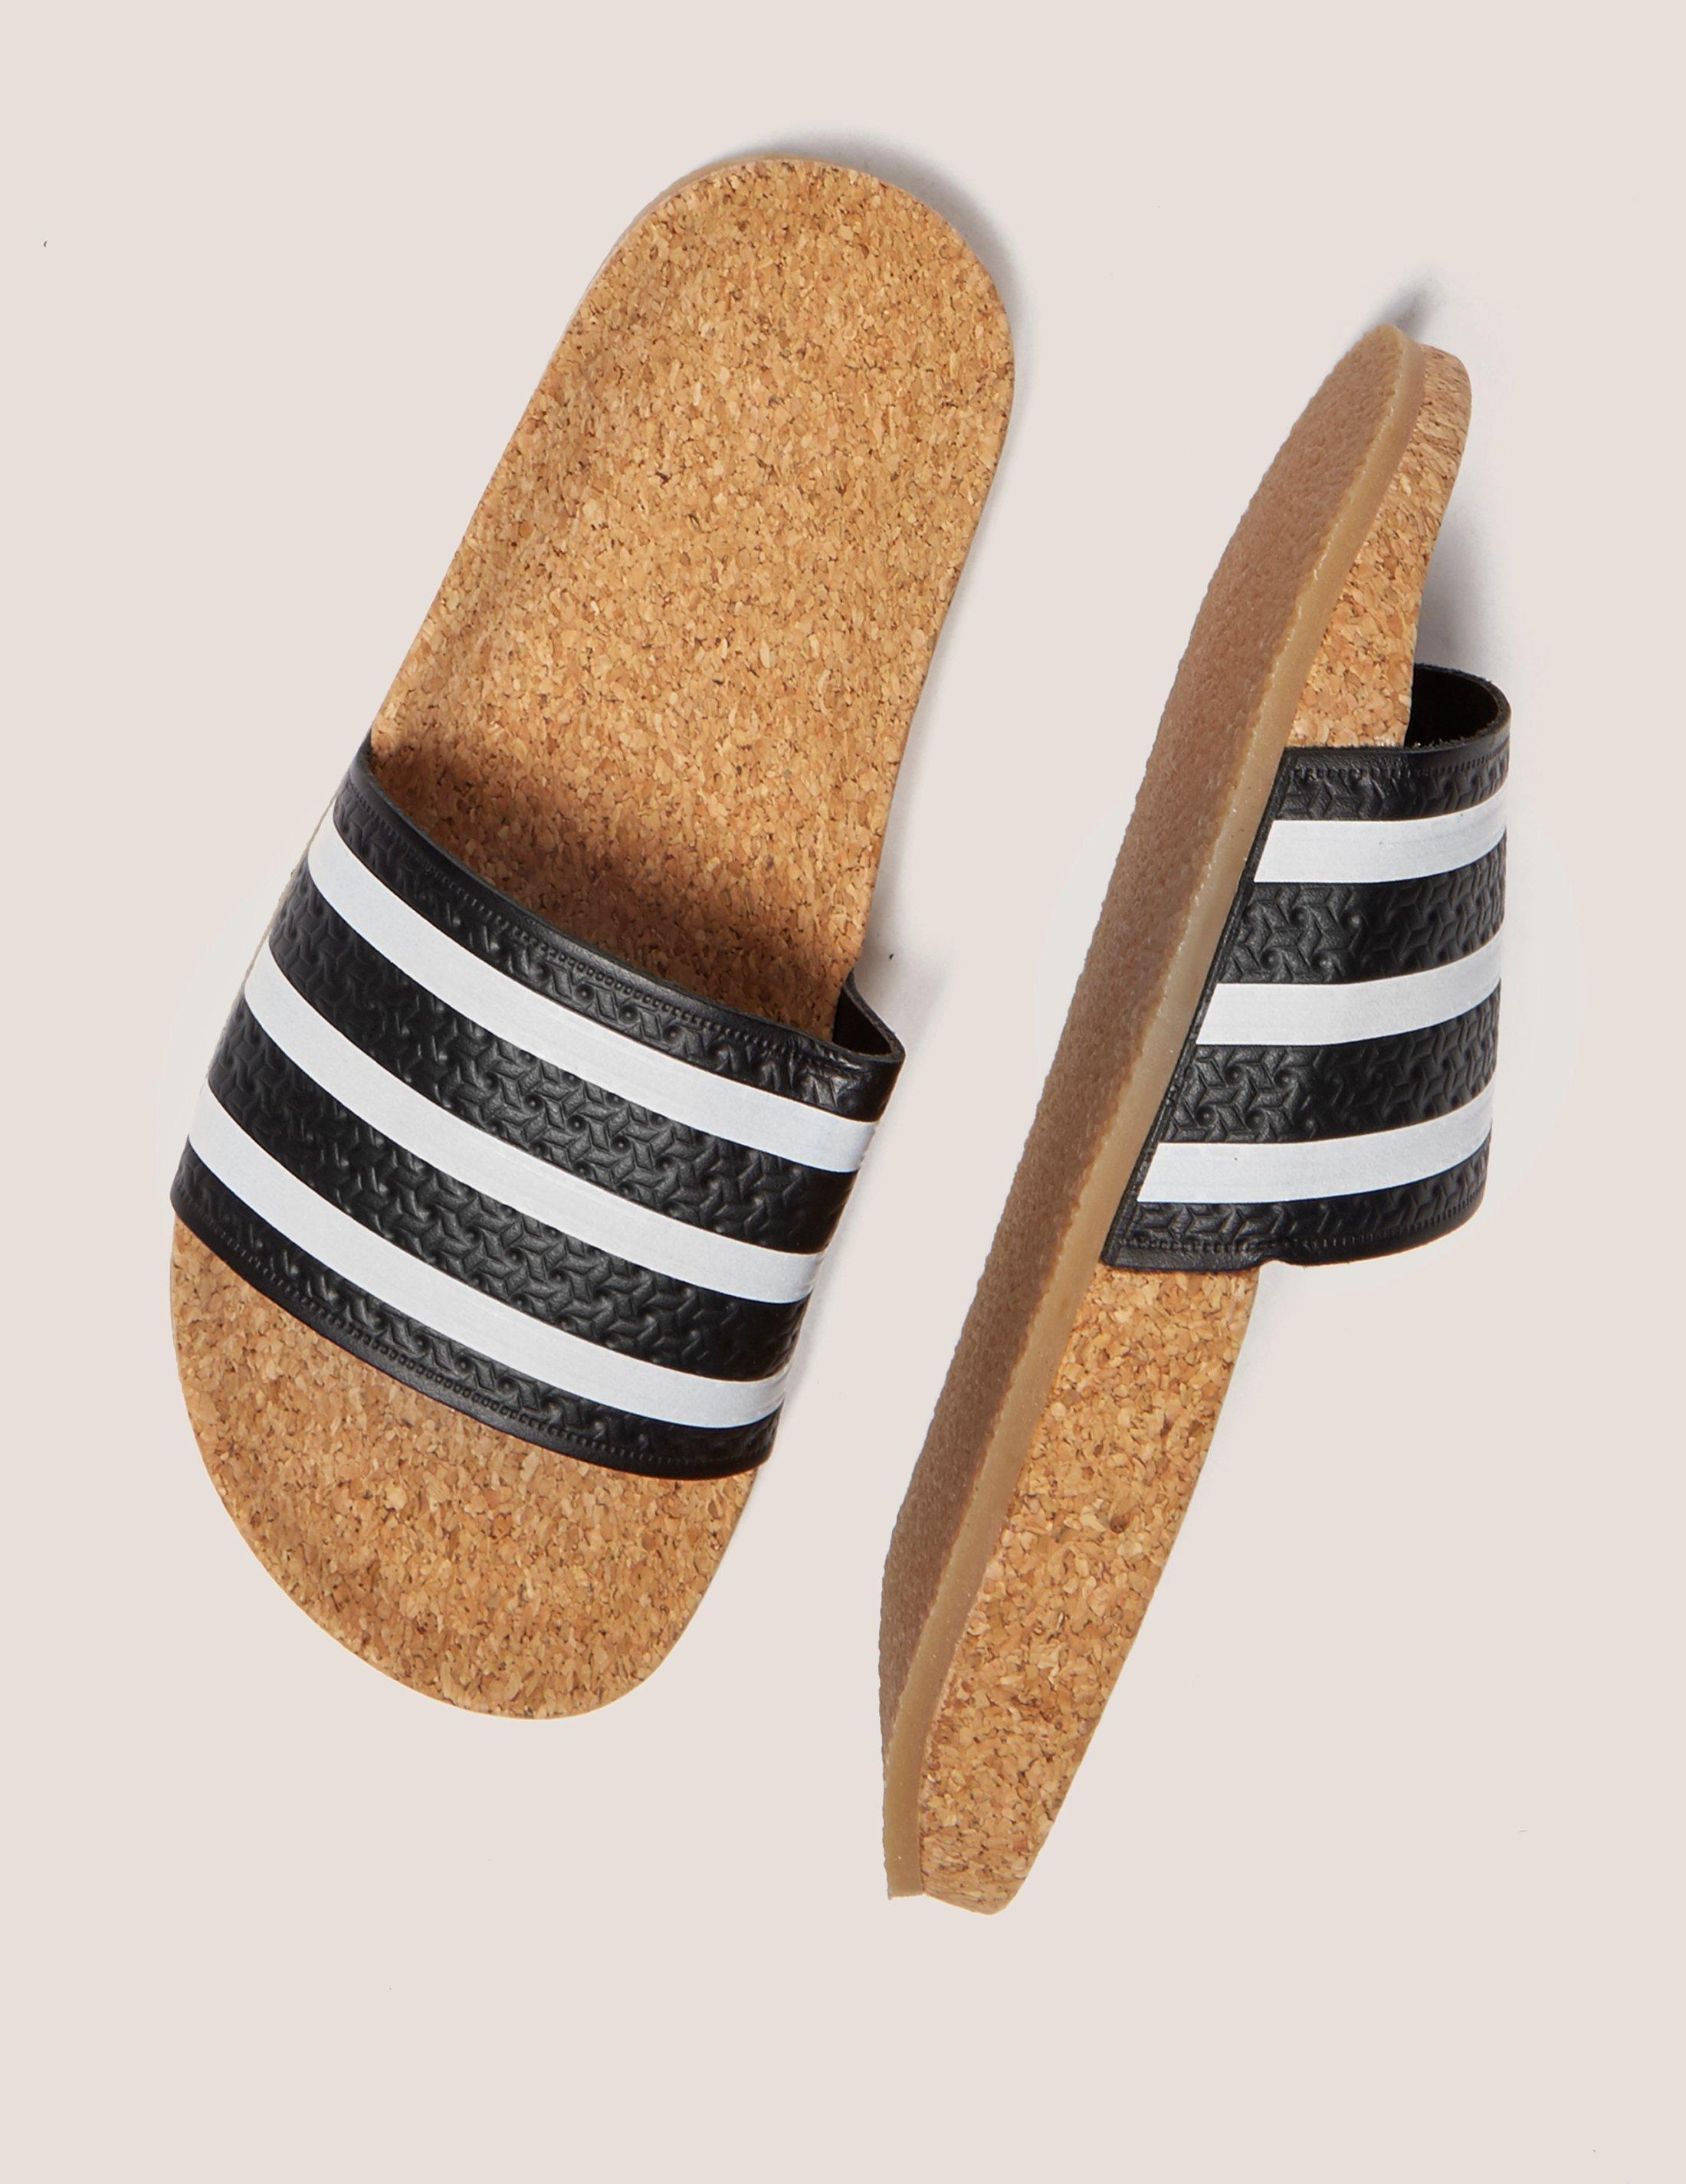 ce5245f757e9 Lyst - adidas Originals Adilette Cork Slides